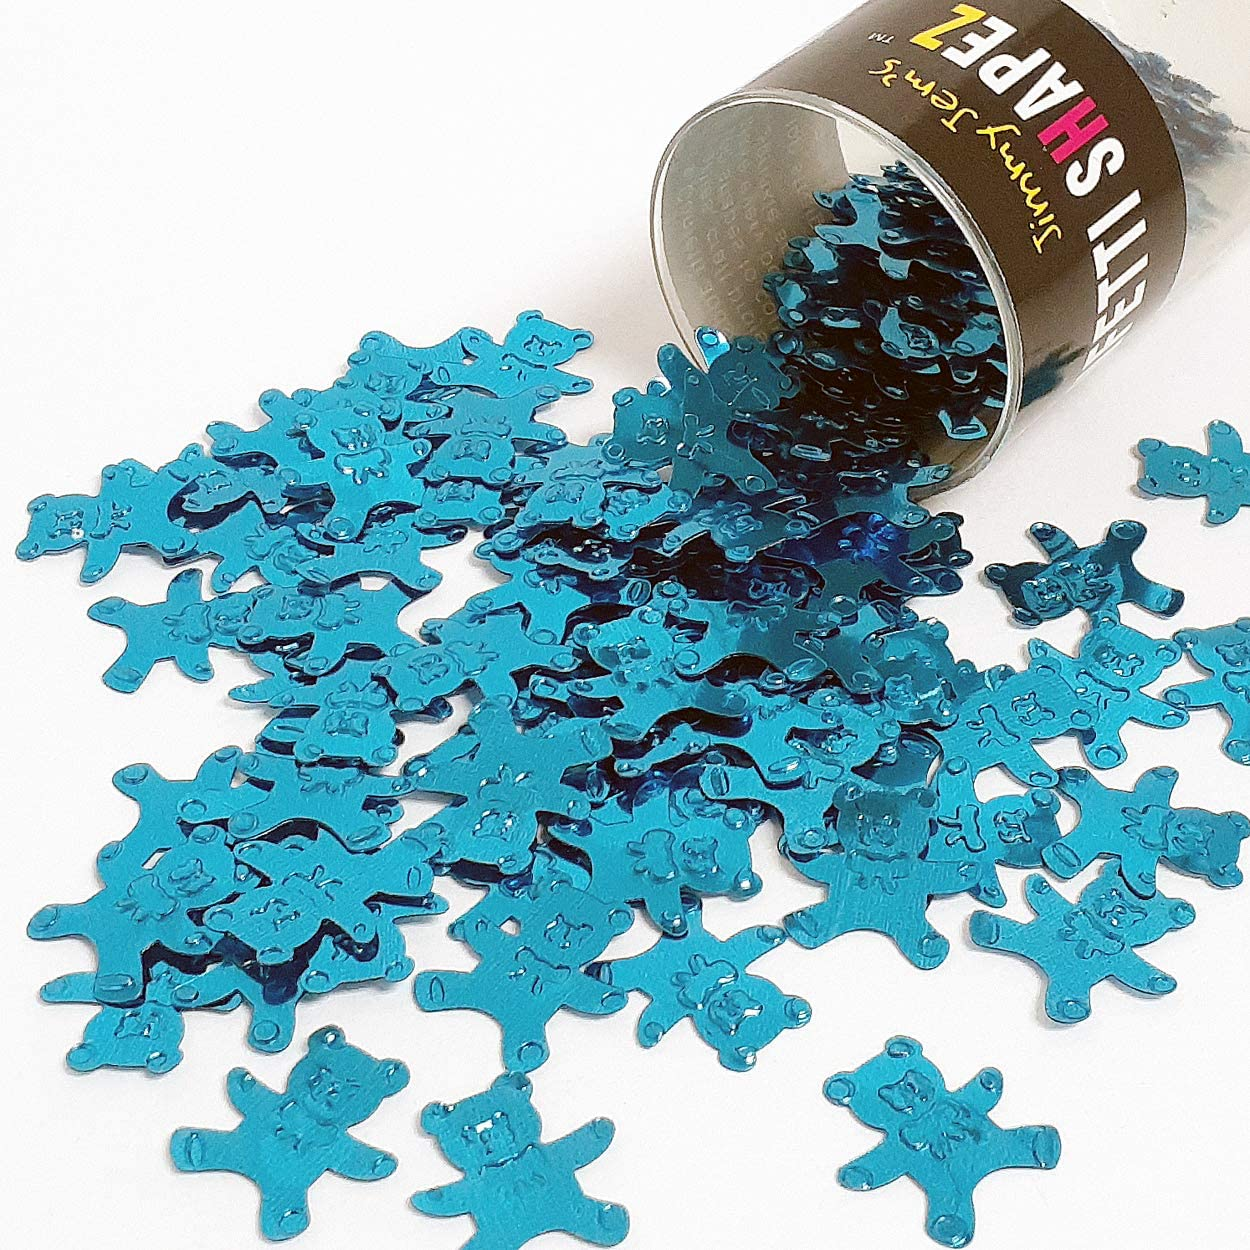 Confetti Teddy Bear in Blue Sky - Retail Pack #9432 QS0